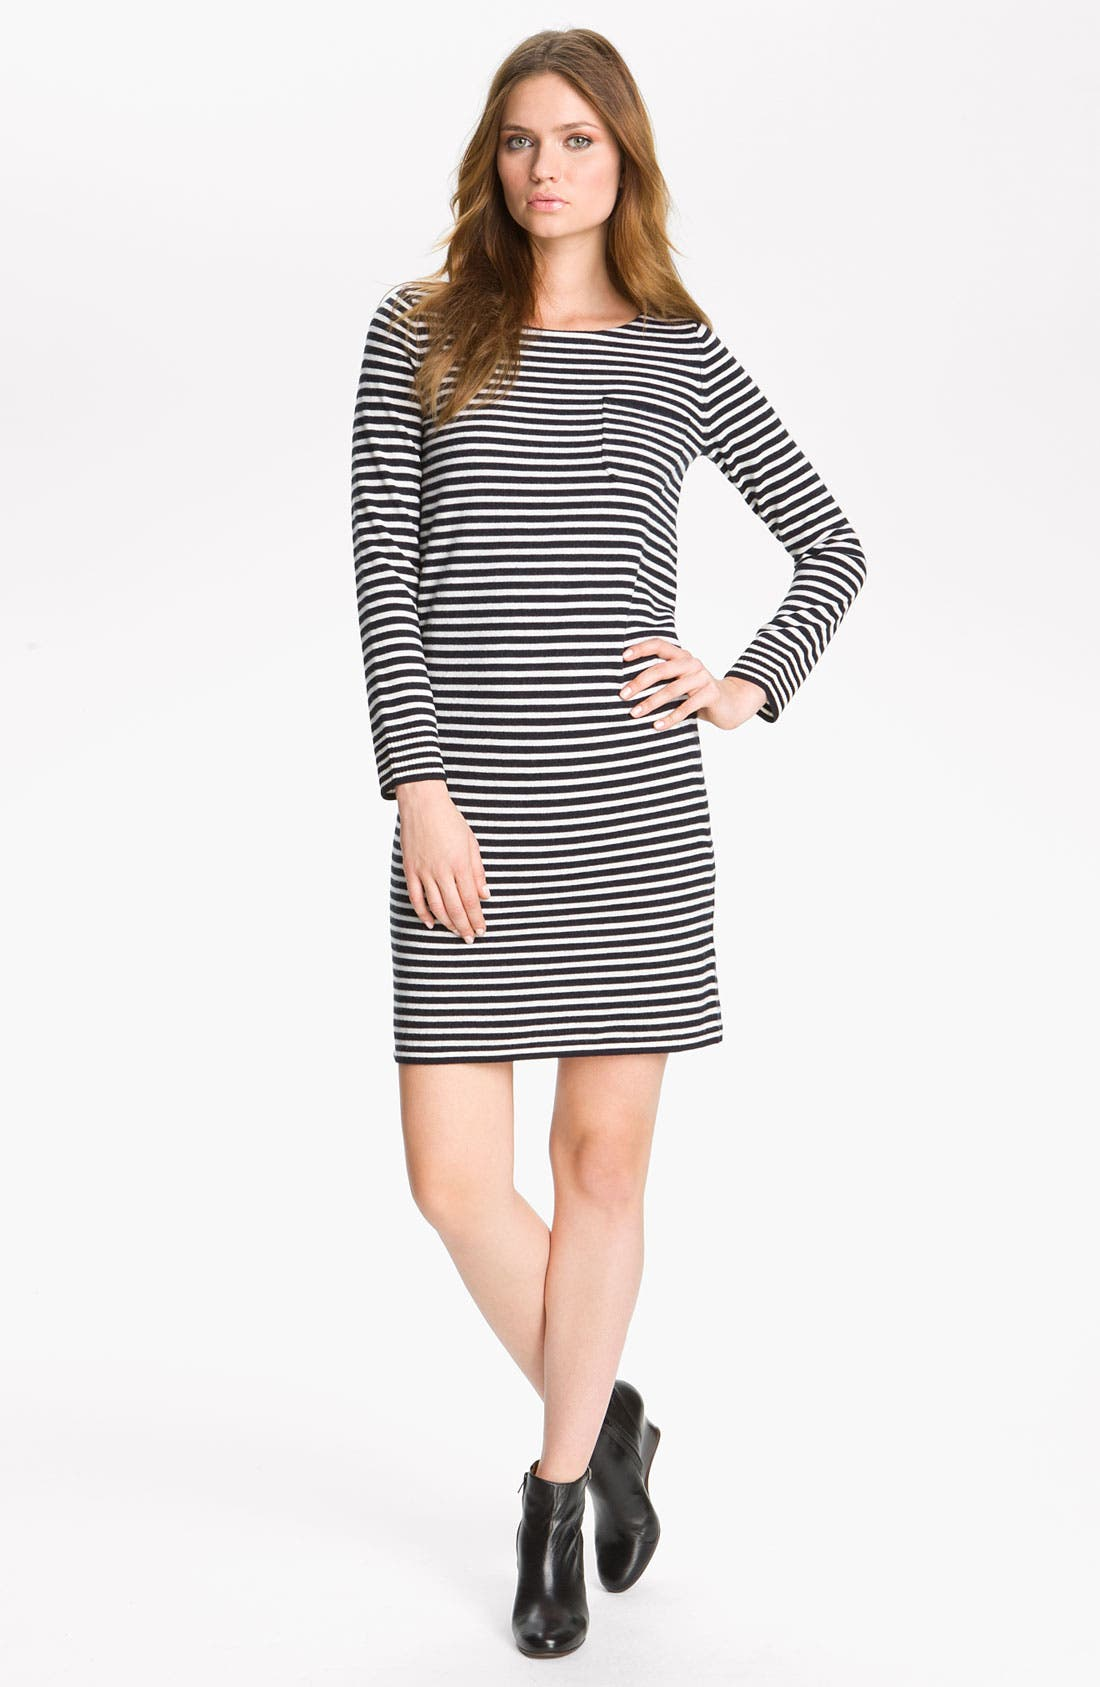 Alternate Image 1 Selected - A.P.C. Stripe Knit Dress